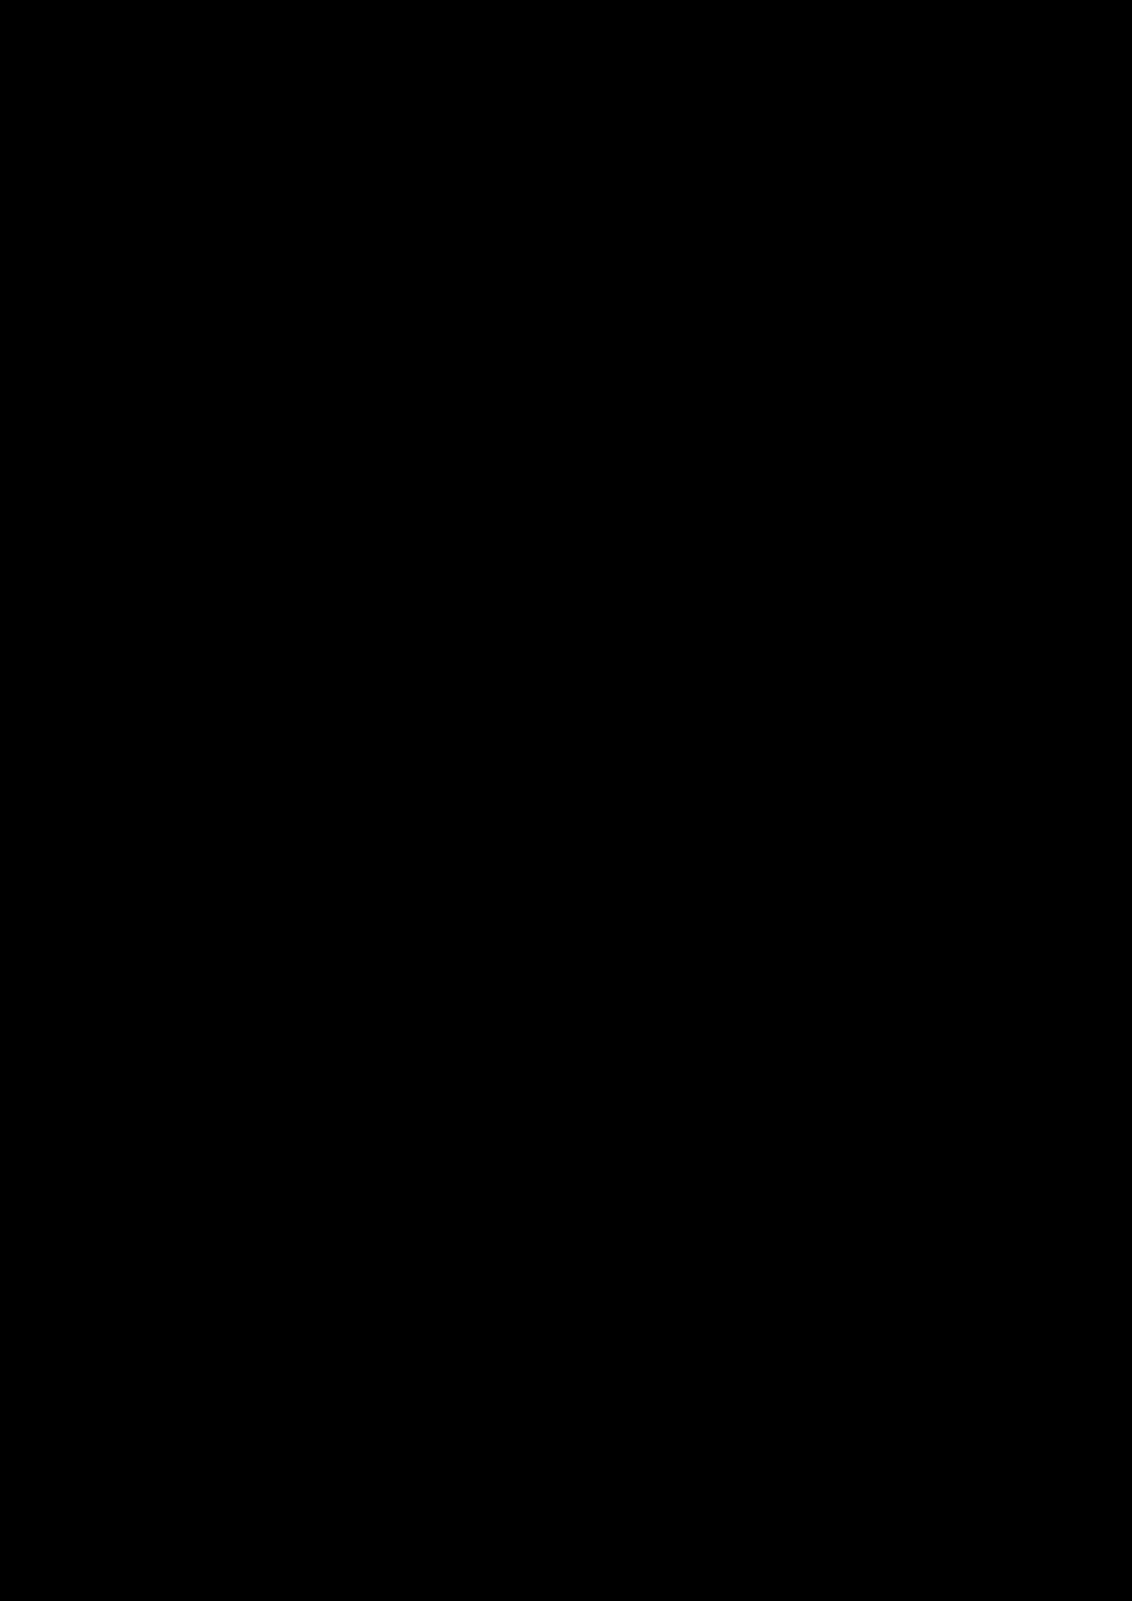 Mrs. Vandebilt slide, Image 16